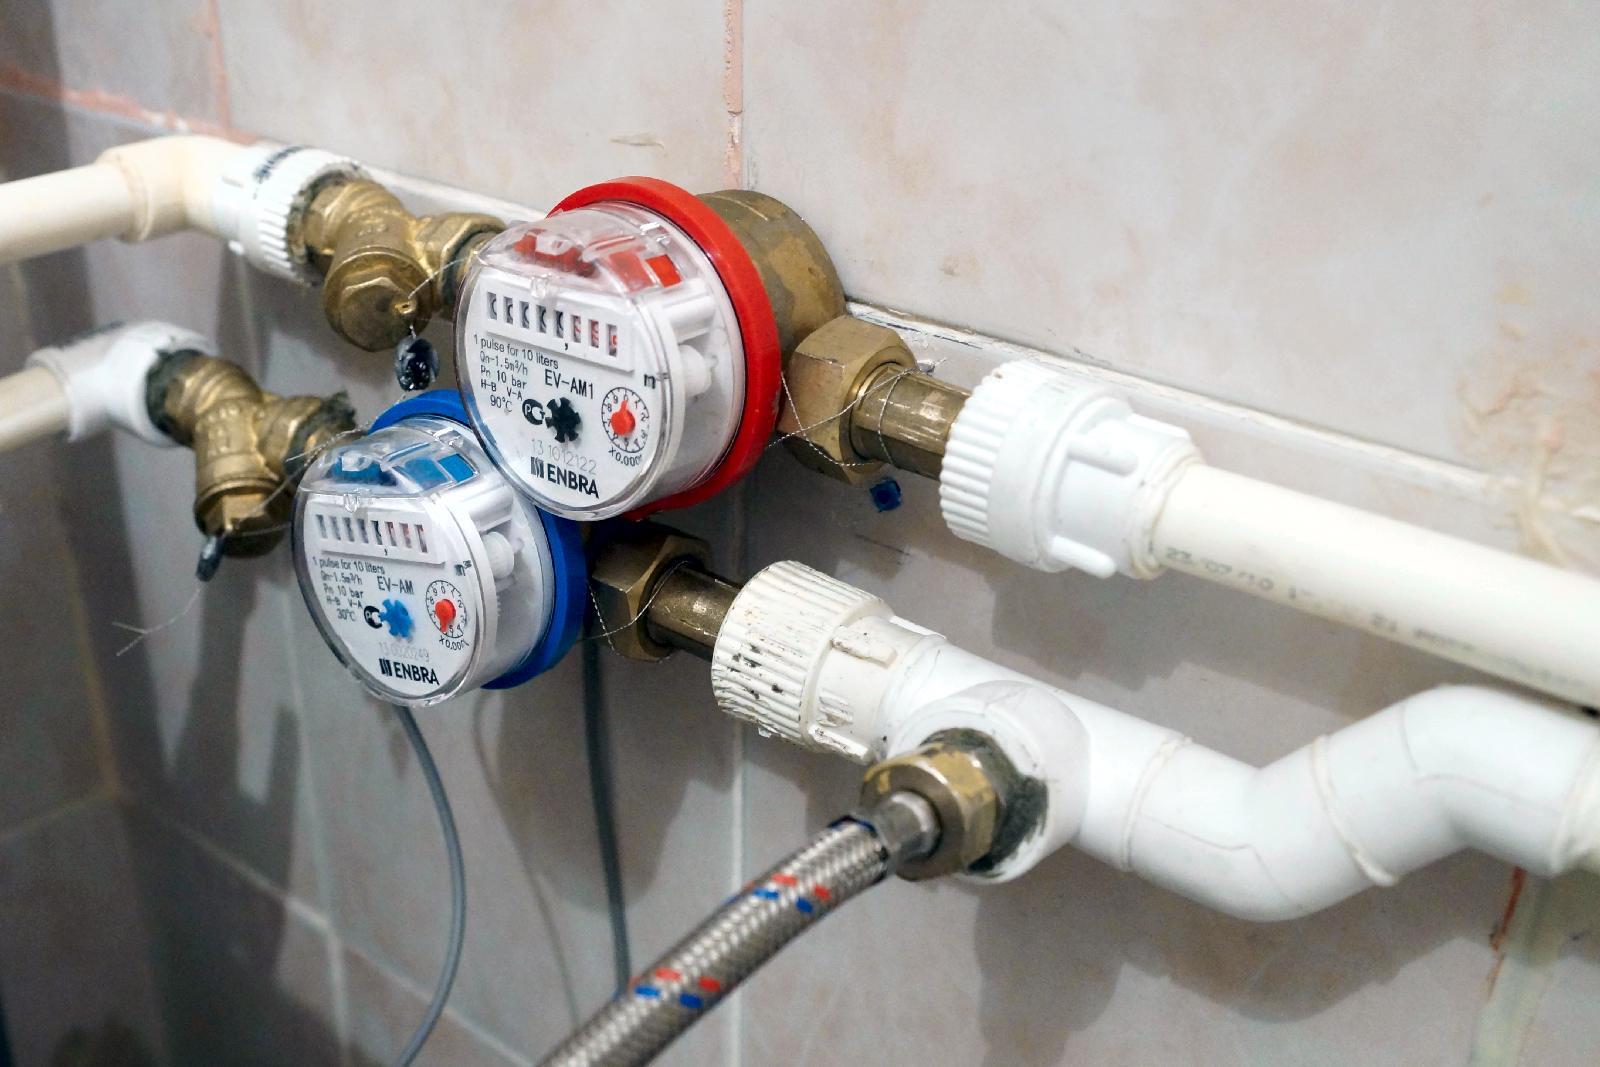 Схема пломбировки счетчика воды в квартире